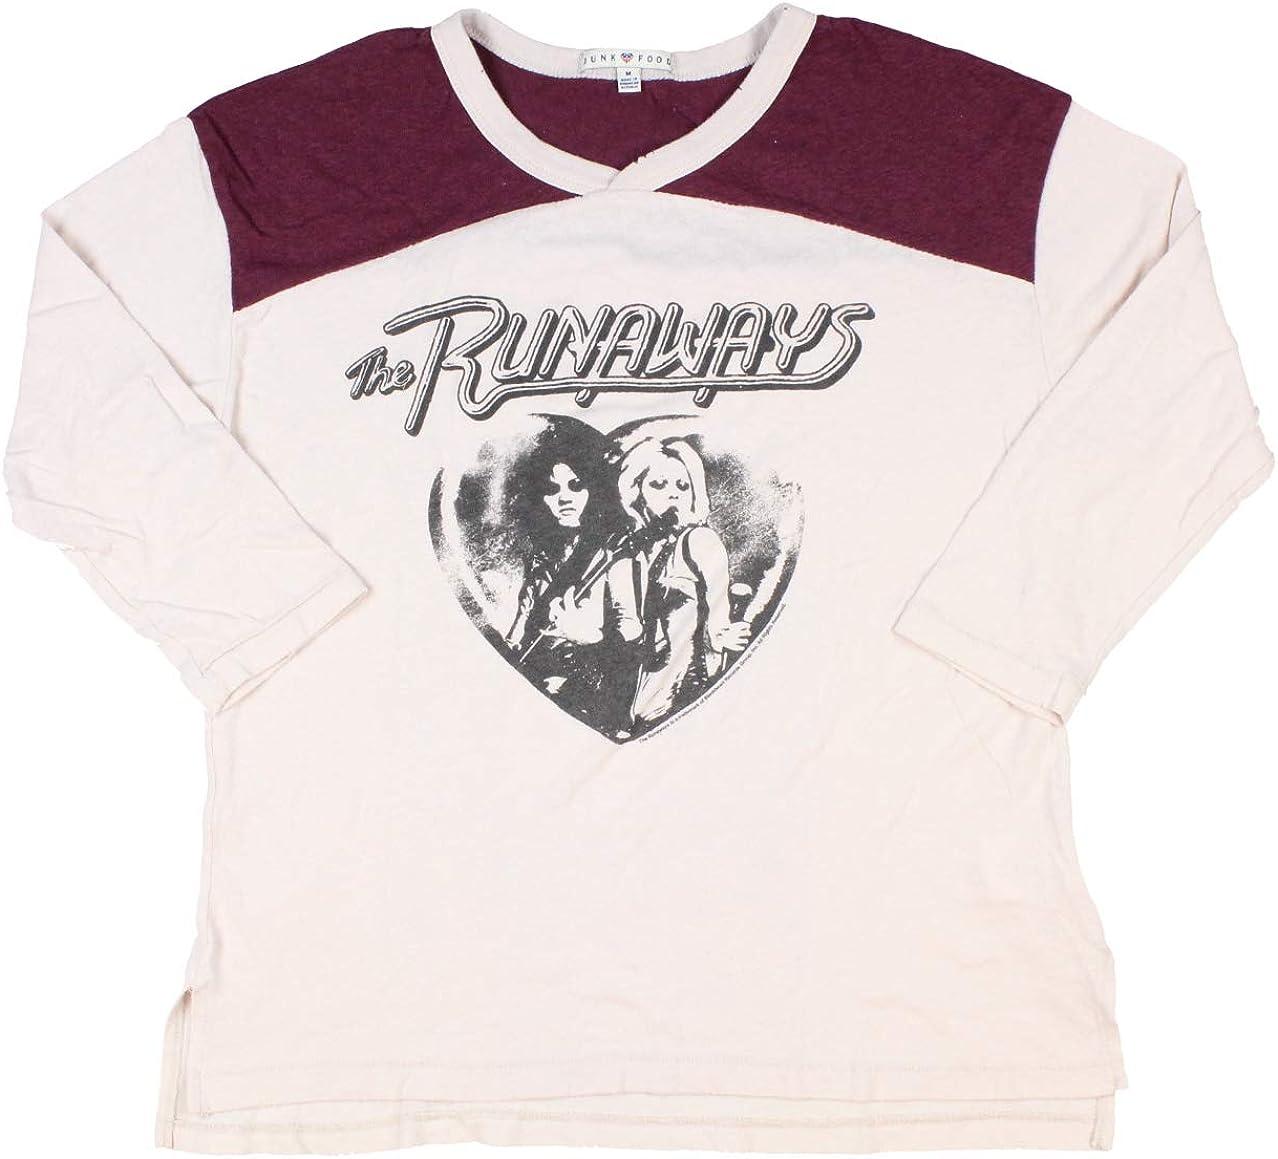 Junk Food The Runaways Junior's All-American Rock Band Vintage T-Shirt